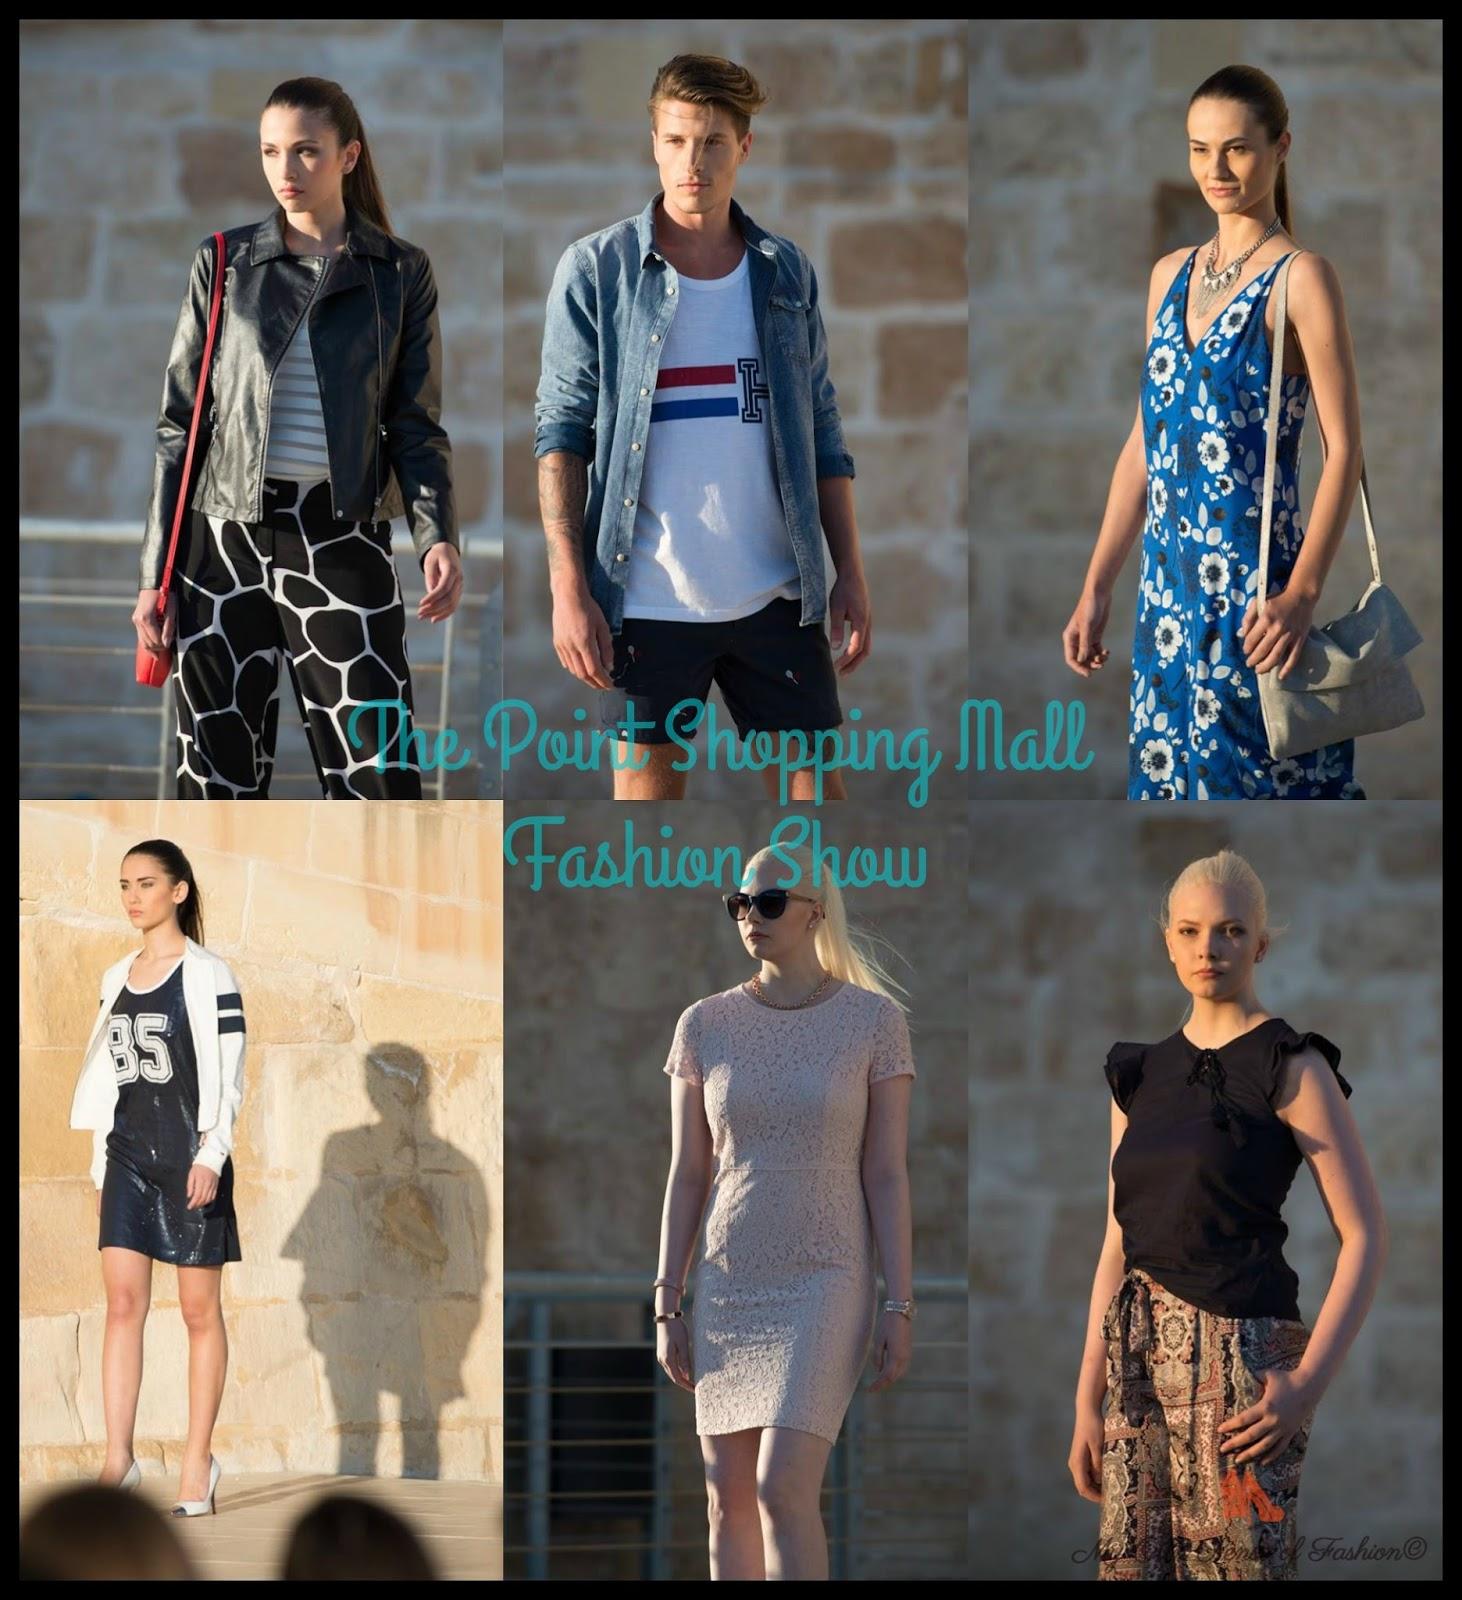 Malta Fashion Week Fashion Awards 2016 Images My Own Sense Of Fashion